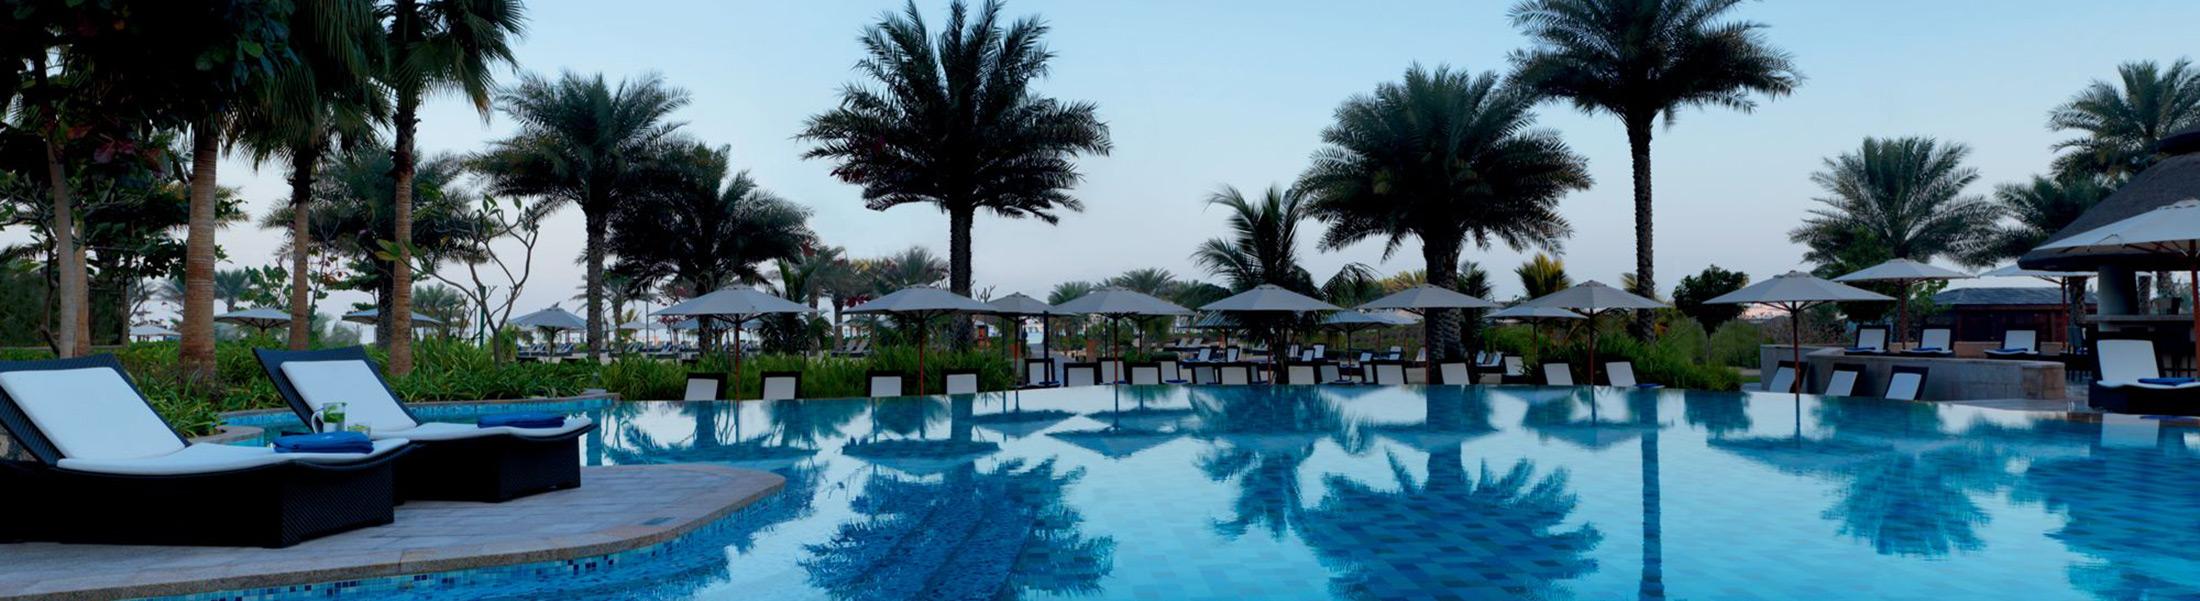 Infinity Pool at Ritz-Carlton Dubai